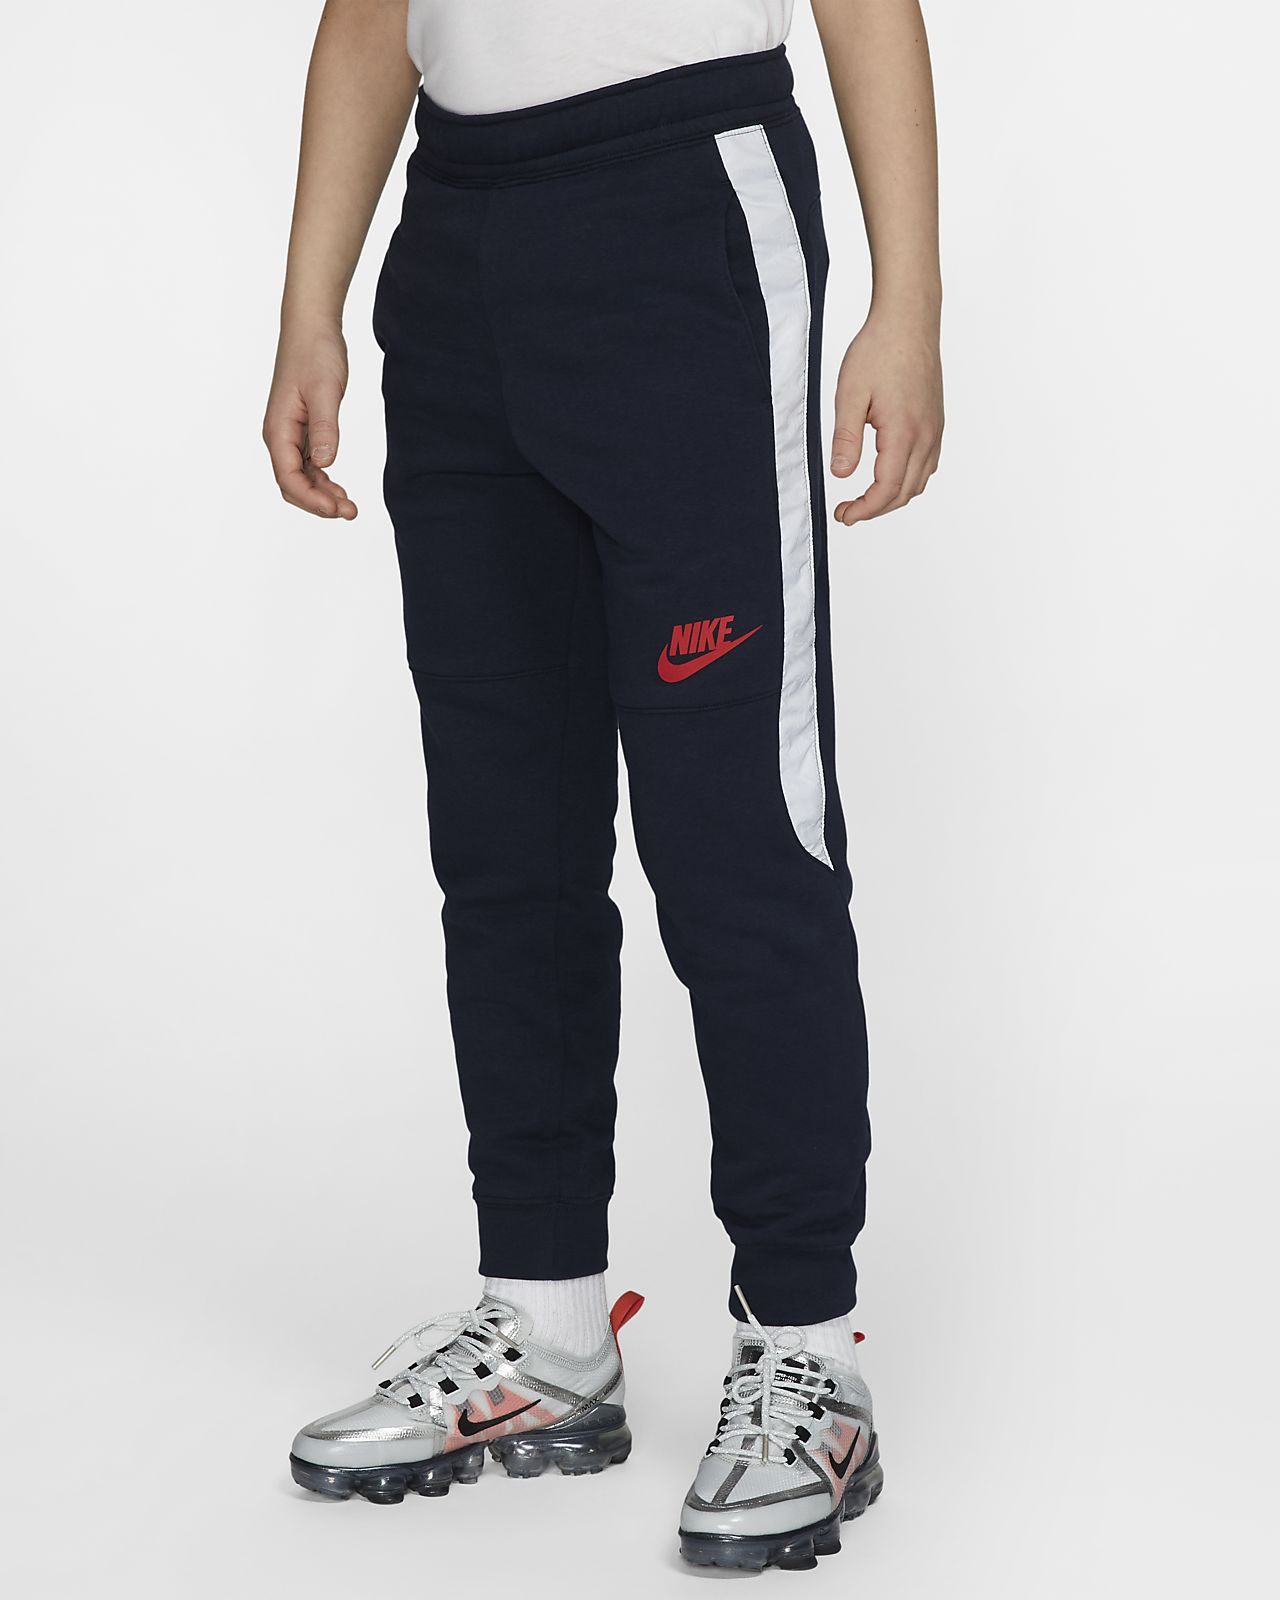 Nike Sportswear Jogger für ältere Kinder